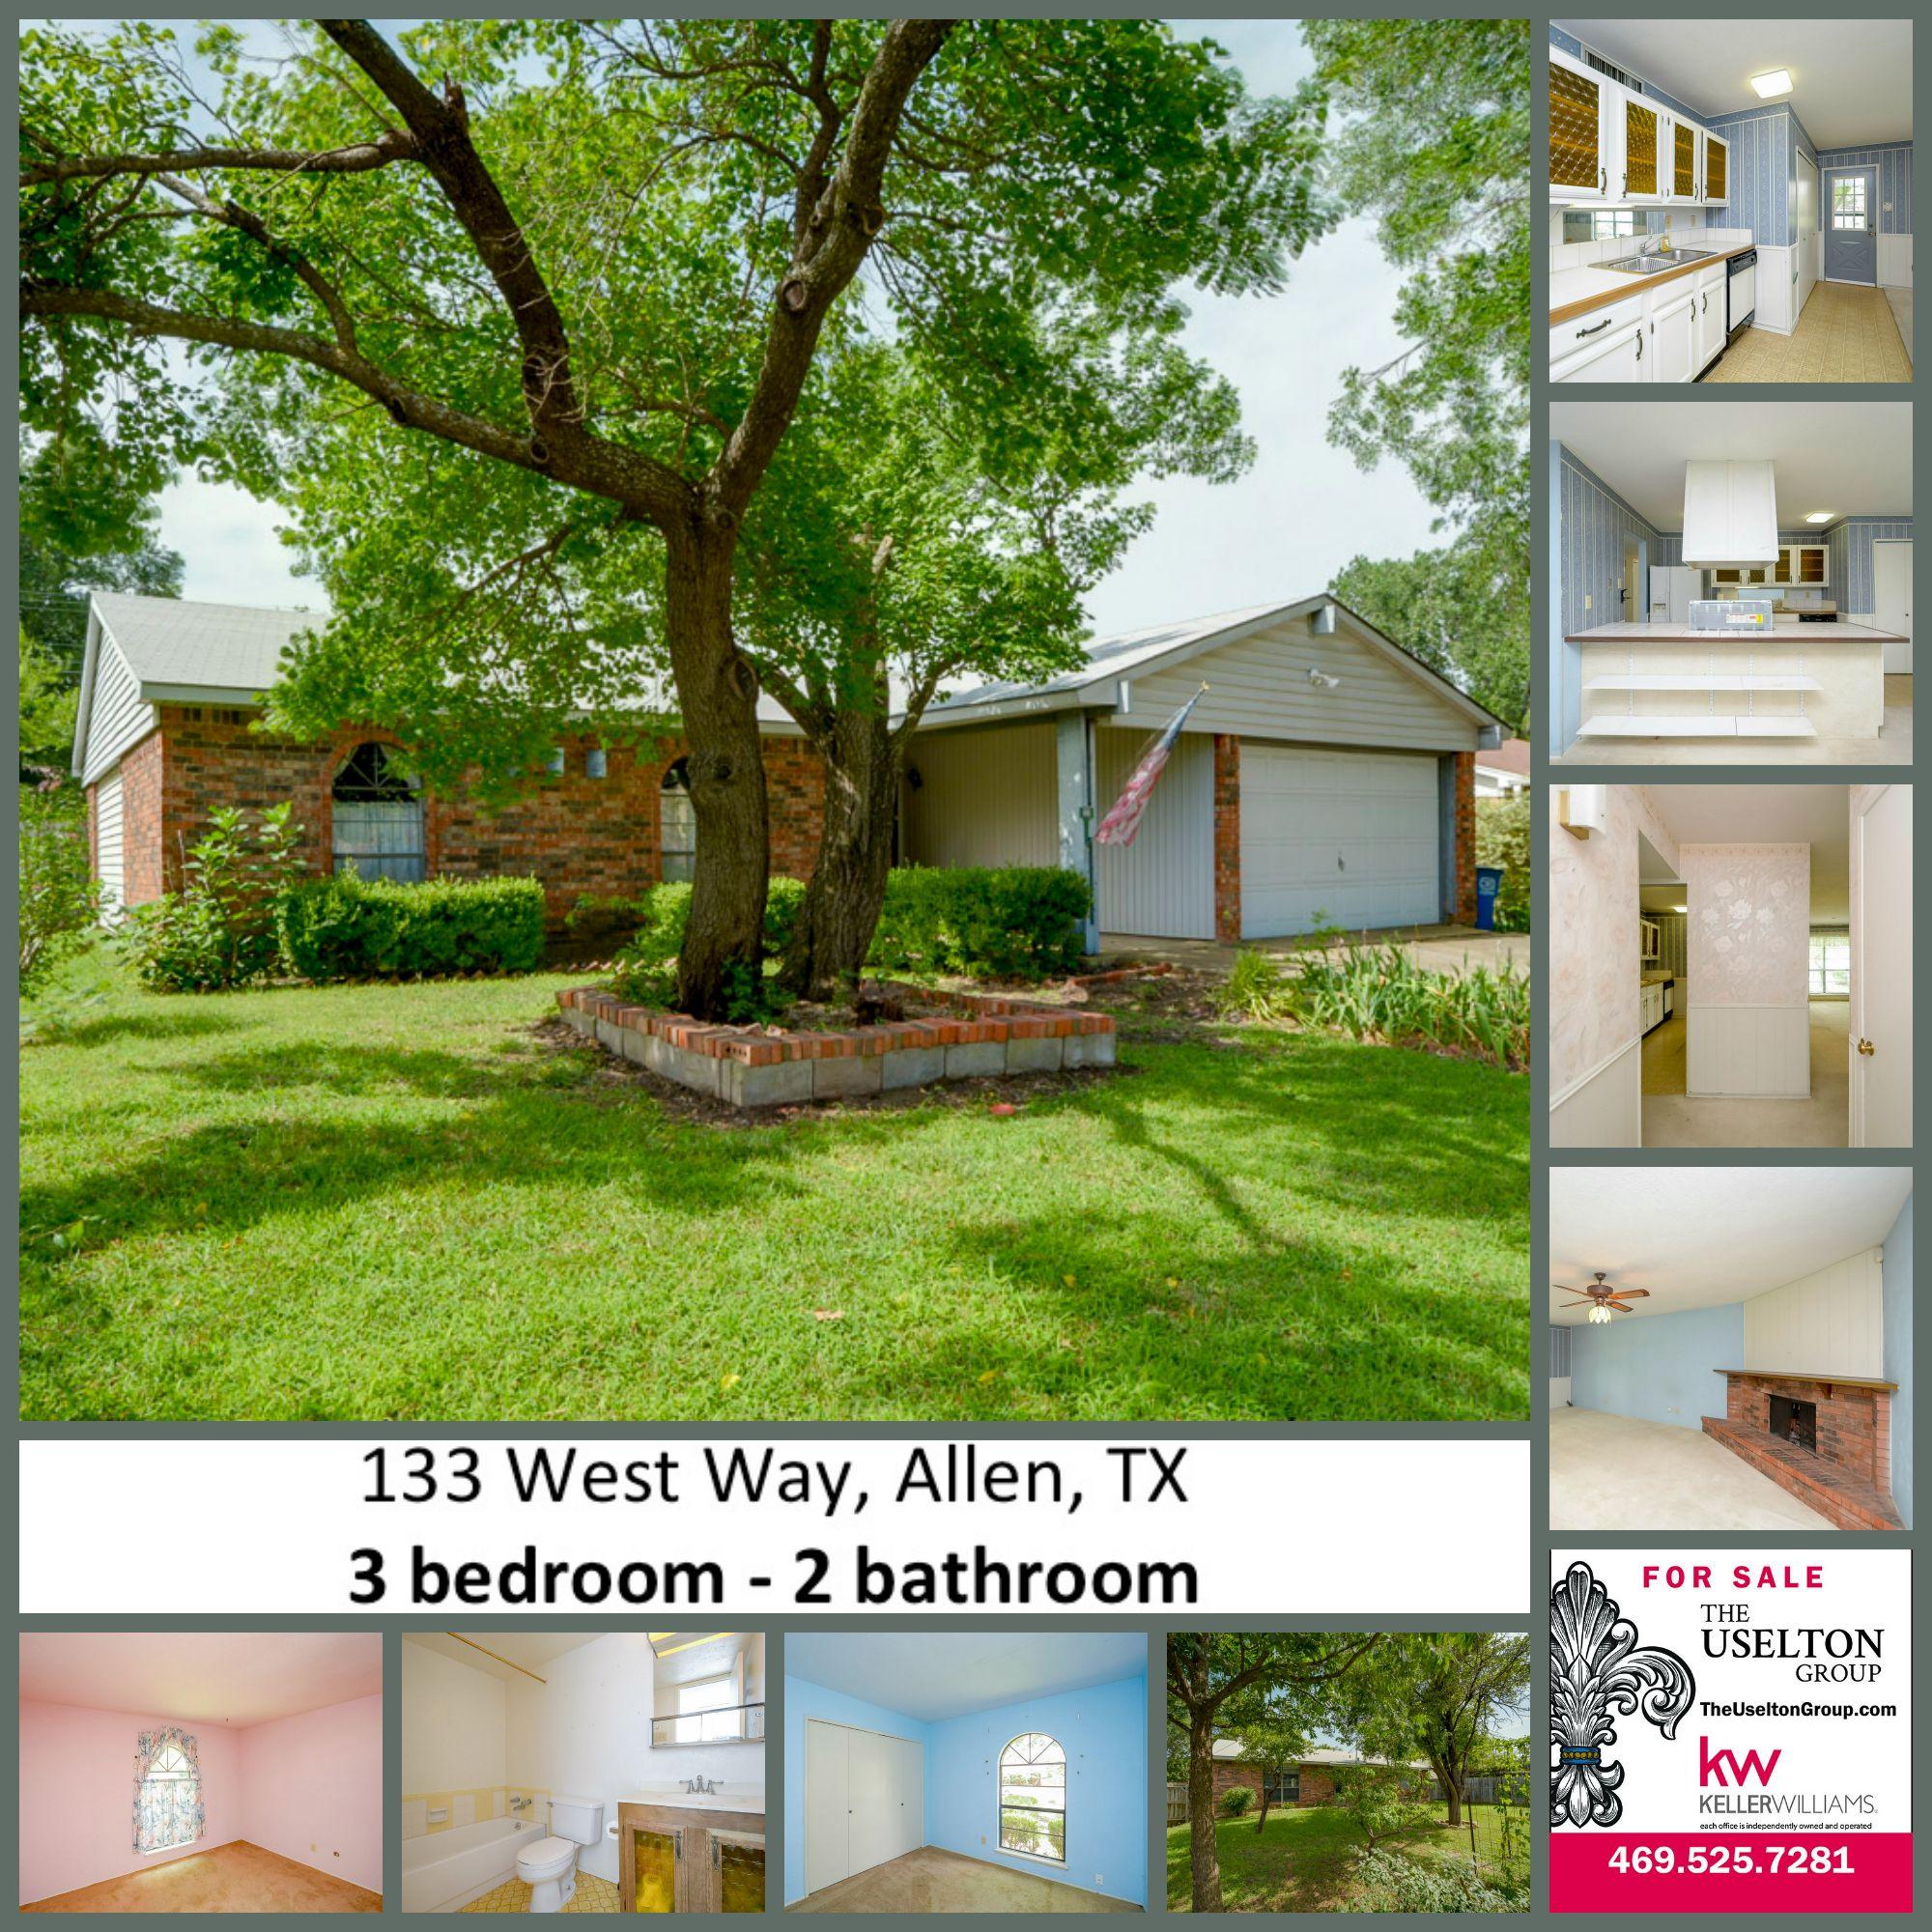 Listing on West Way in Allen, TX Charming 3 bed 2 bath